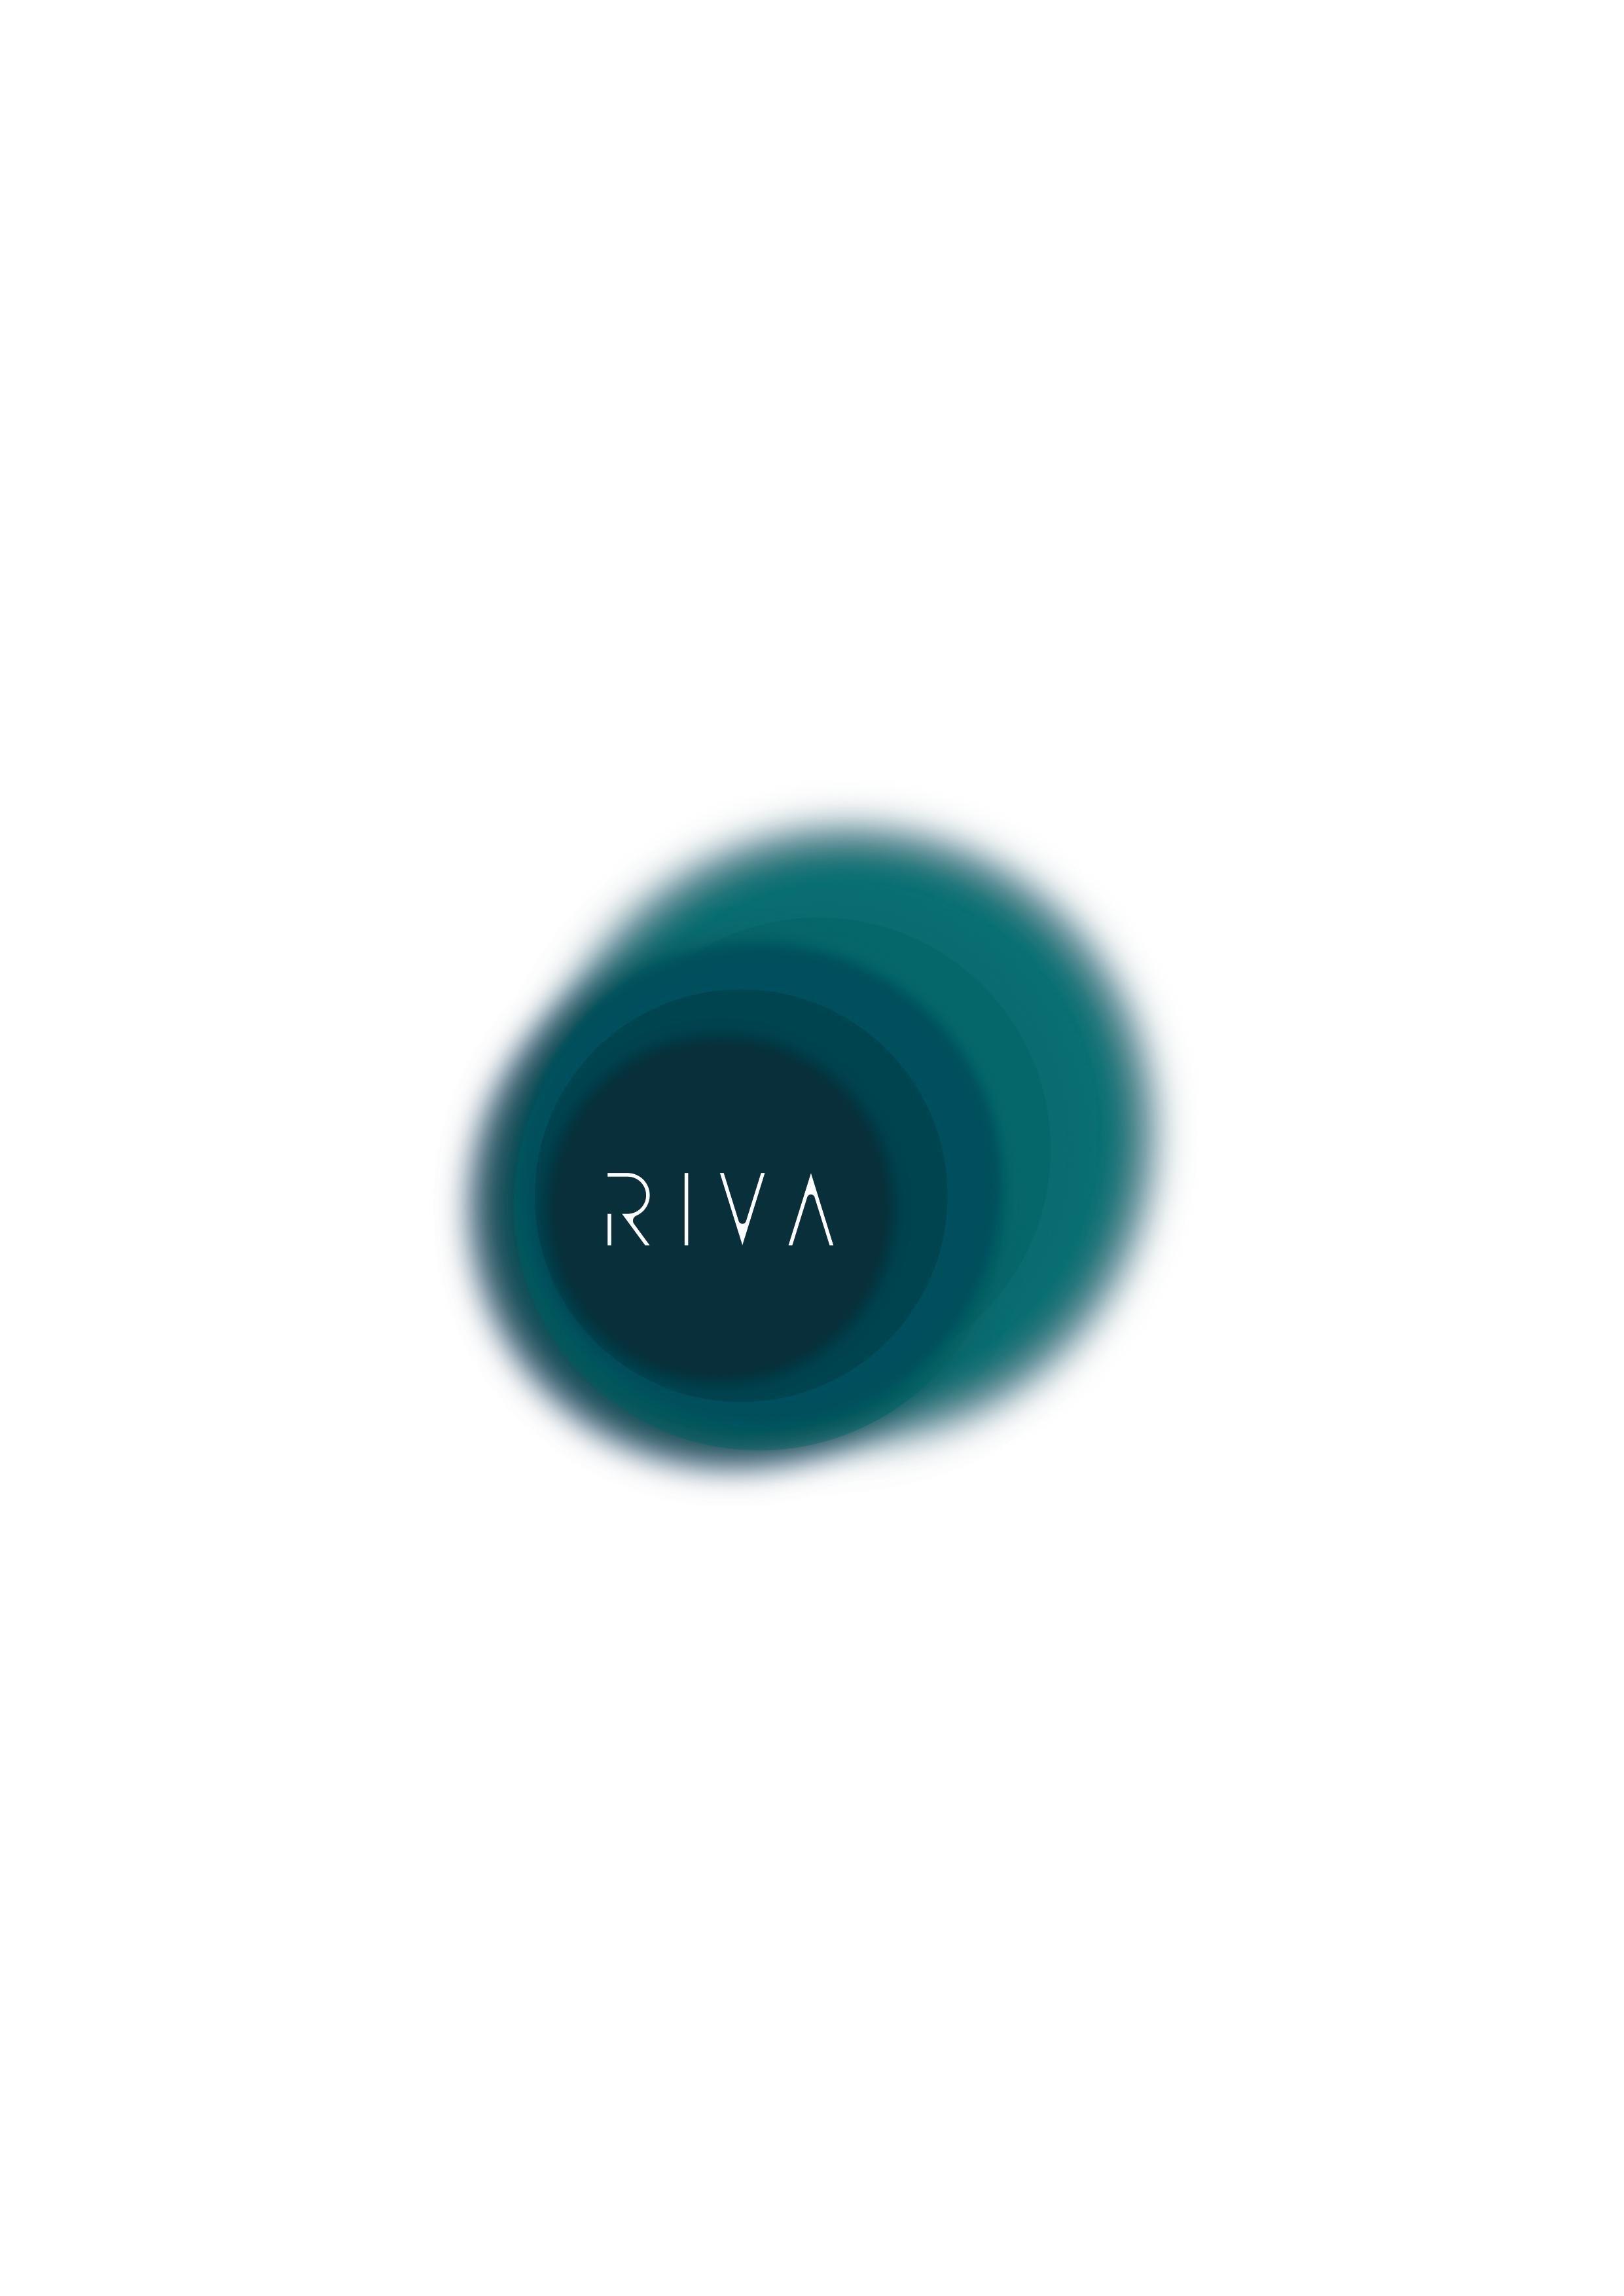 RIVA 2017